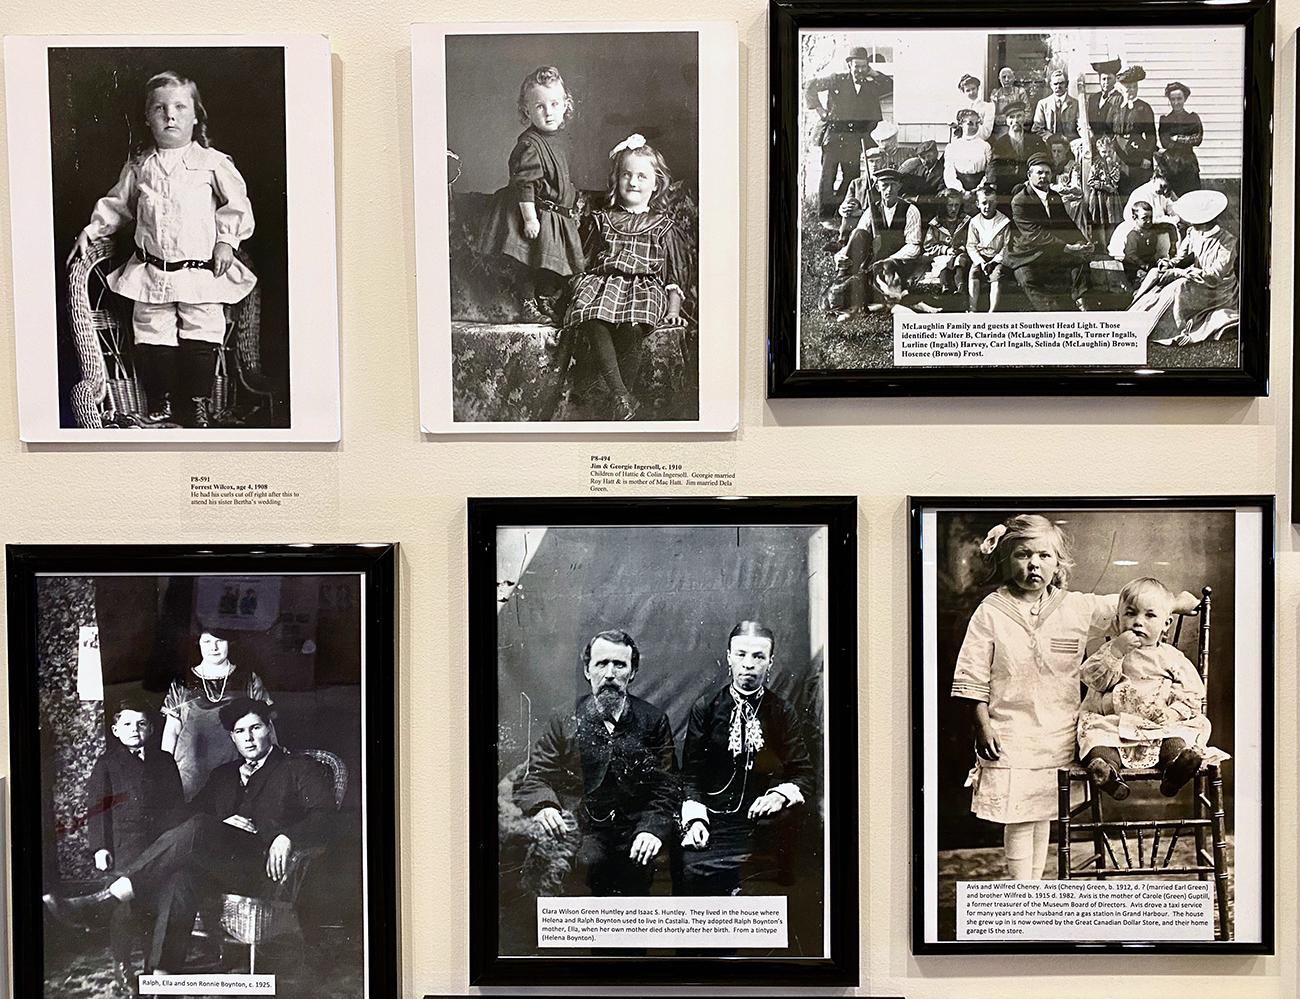 https://0901.nccdn.net/4_2/000/000/081/4ce/3-permanent-exhibits-main-level-7th-link-photography---memorial.jpg